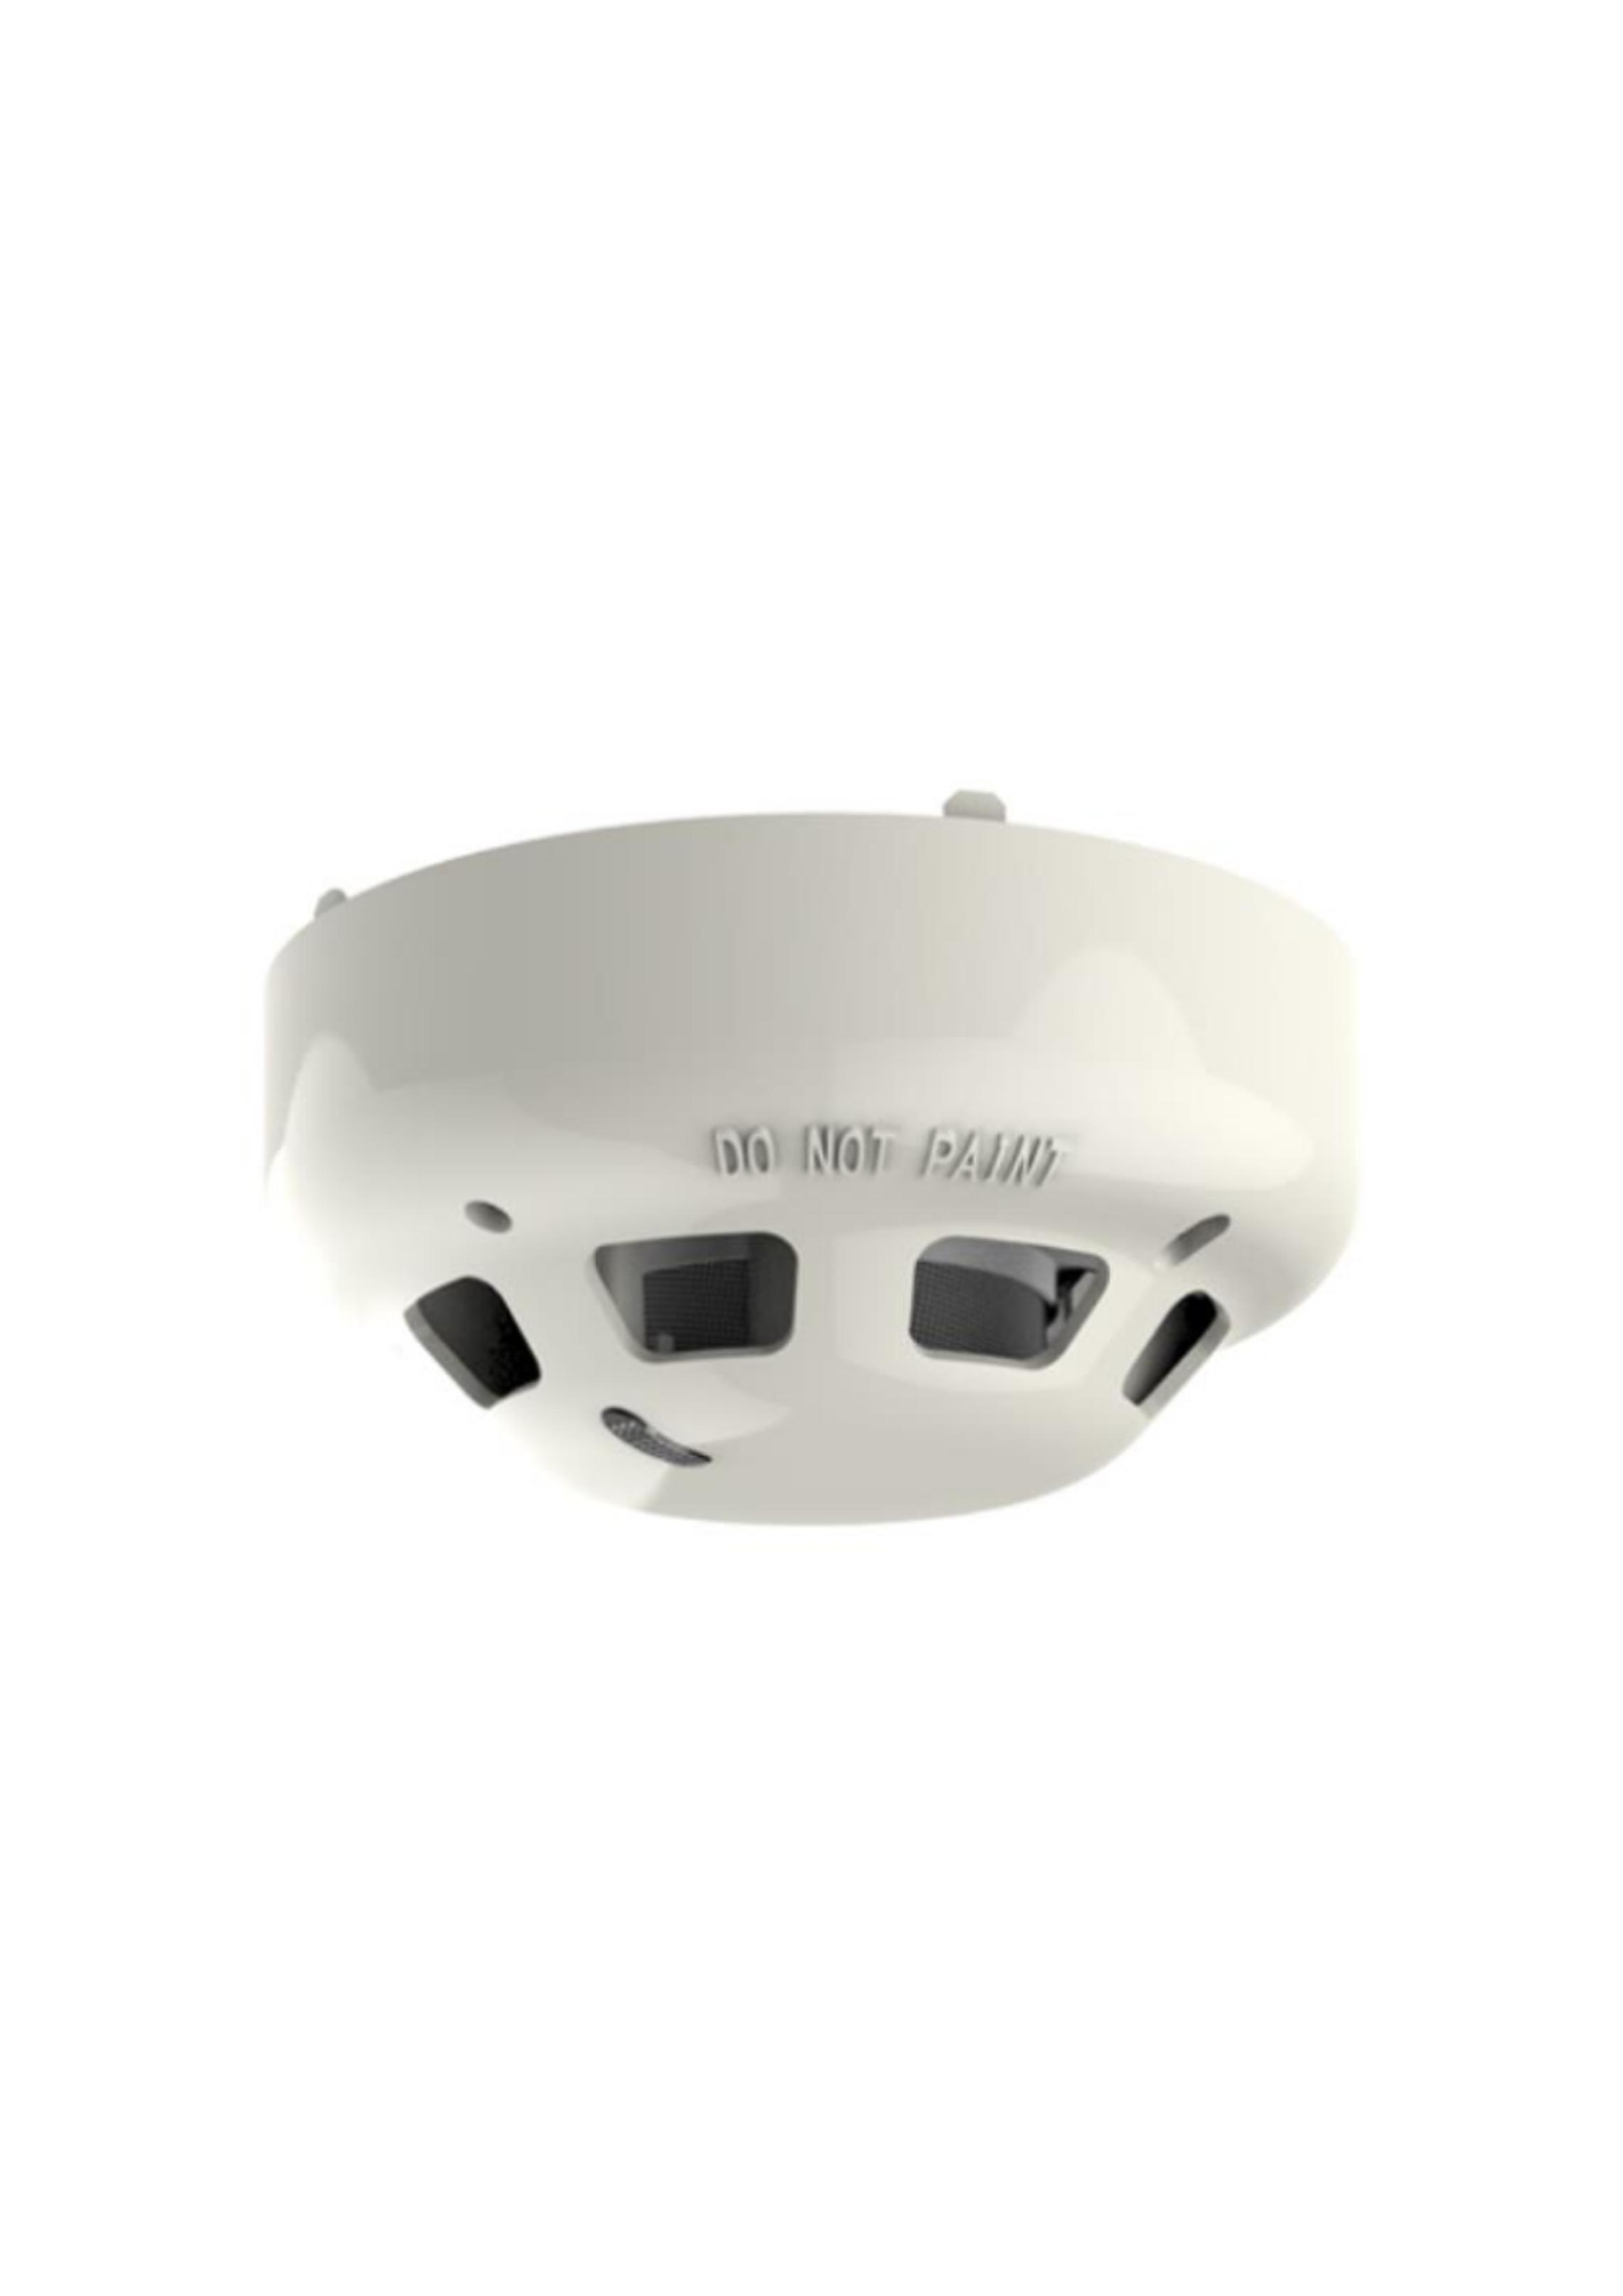 Photoelectric Smoke Detector - White Case 1212300-...